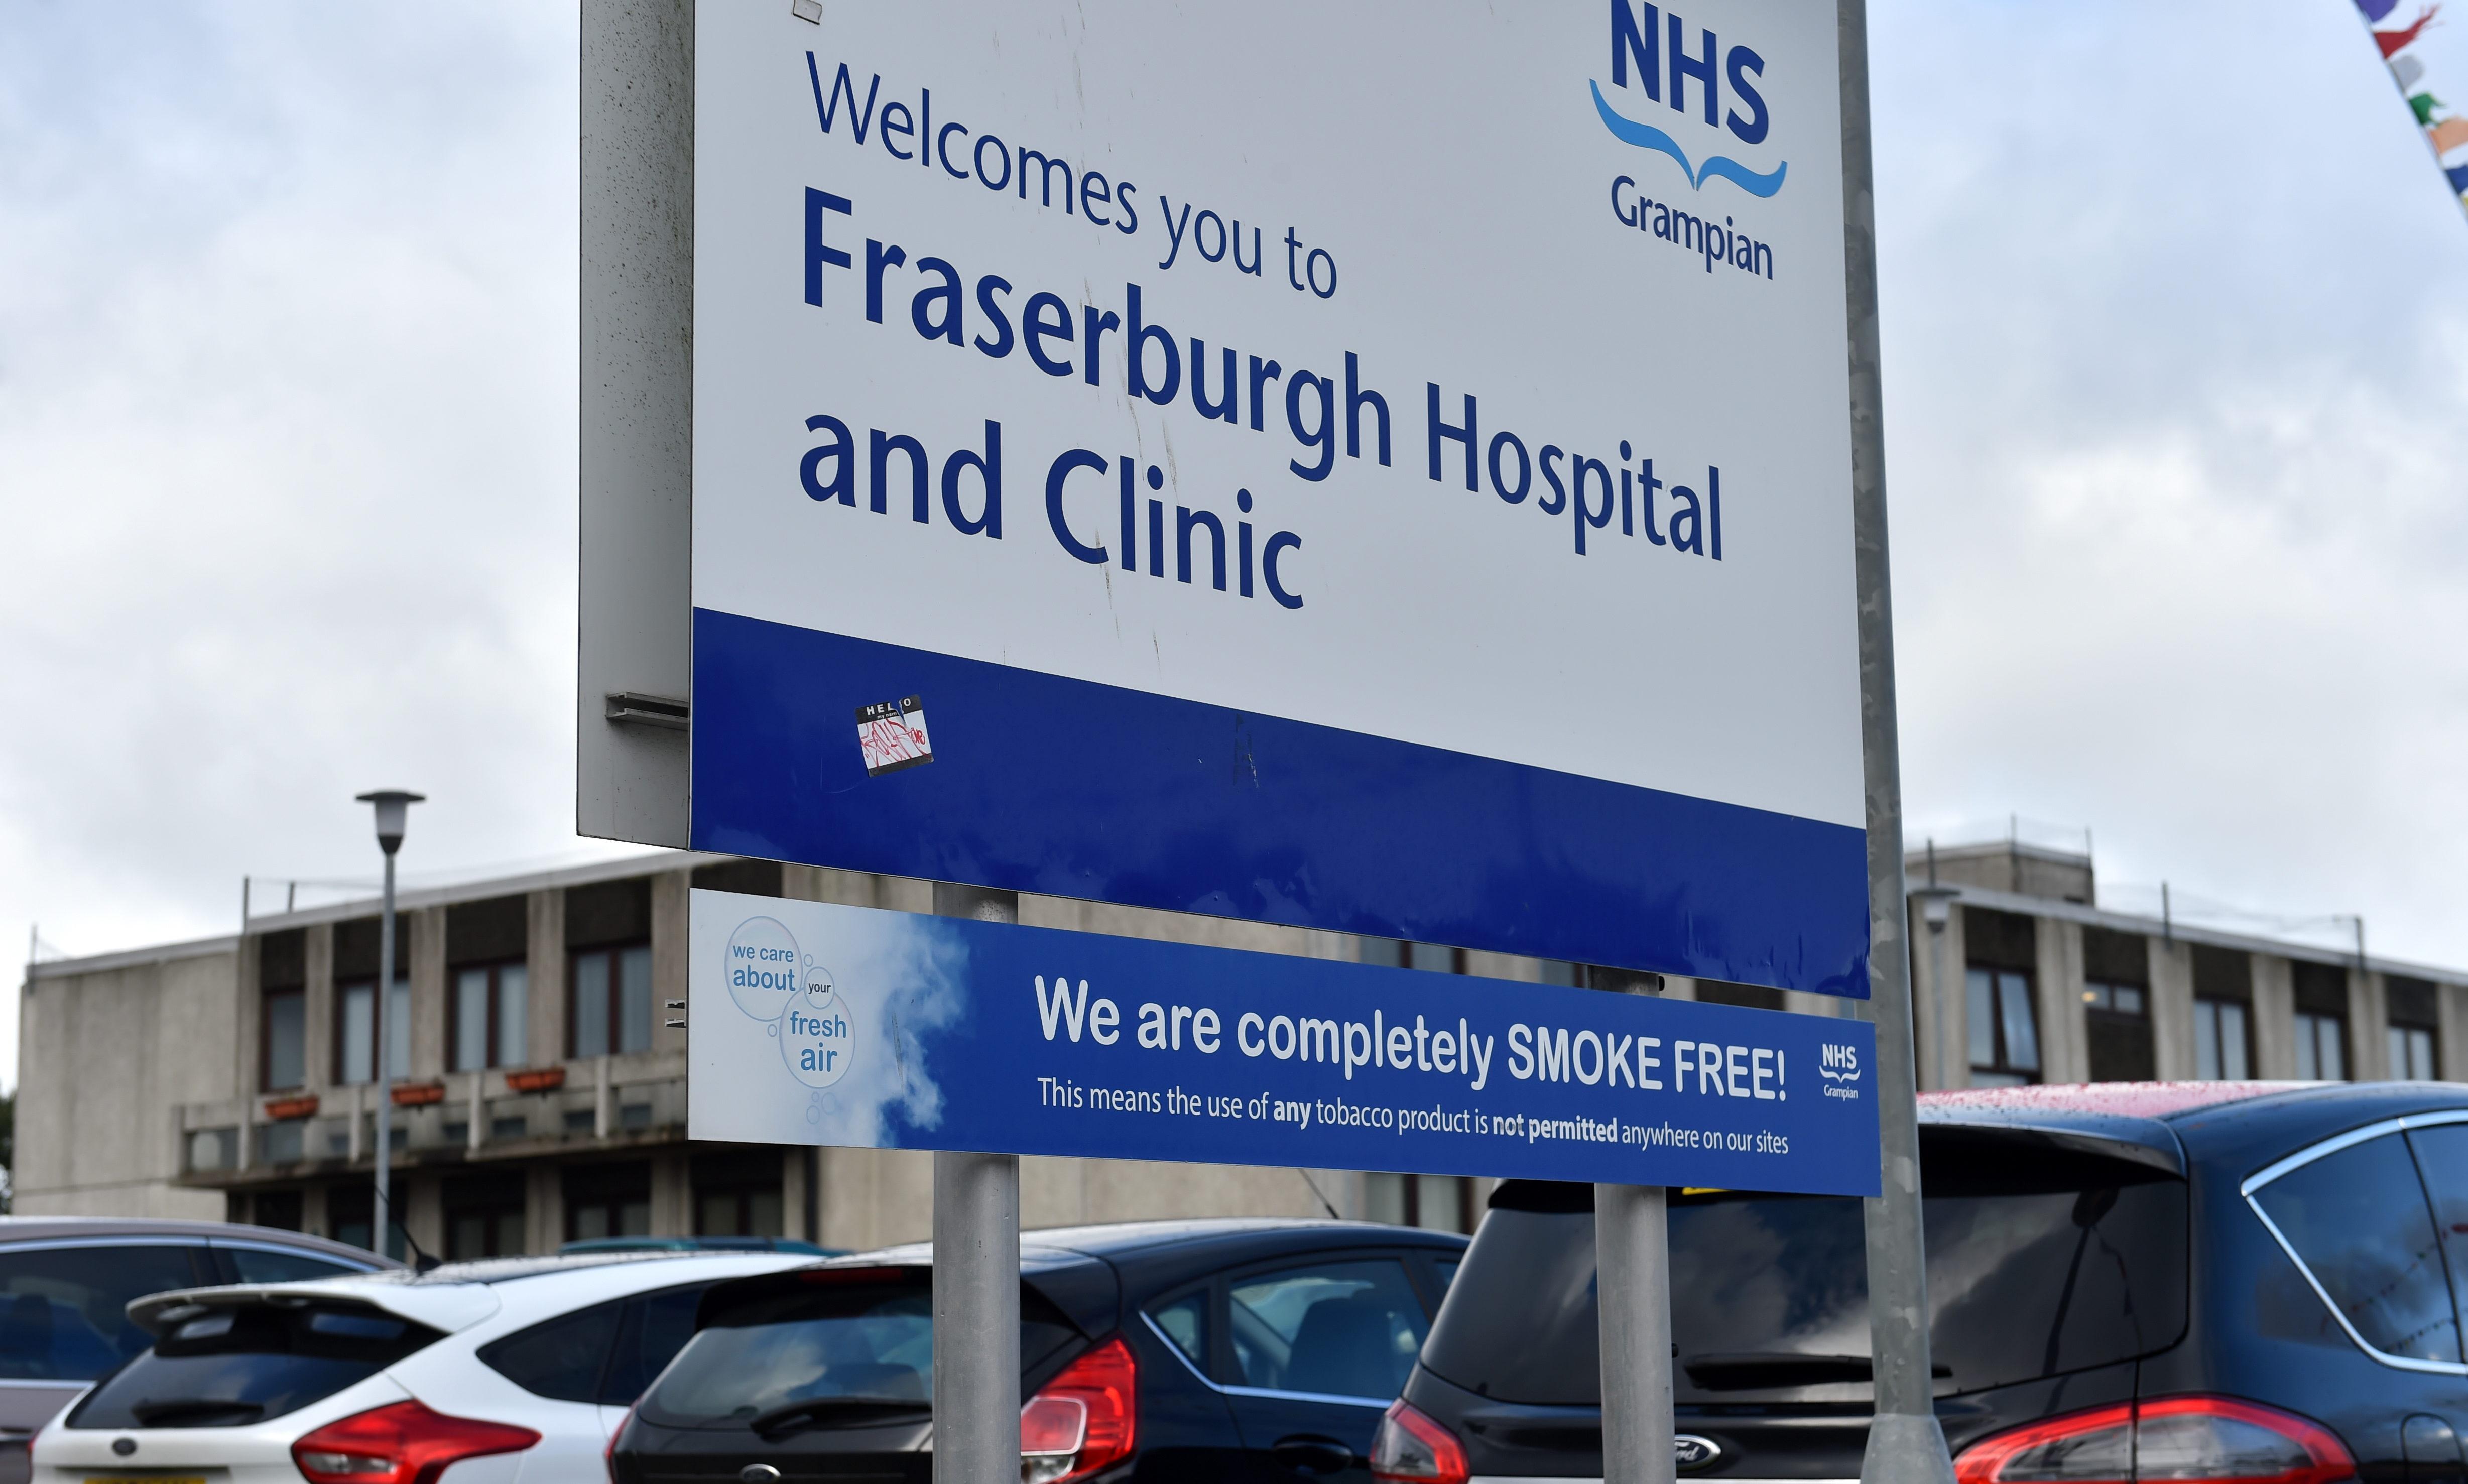 Mrs Onoh had been volunteering at Fraserburgh Hospital